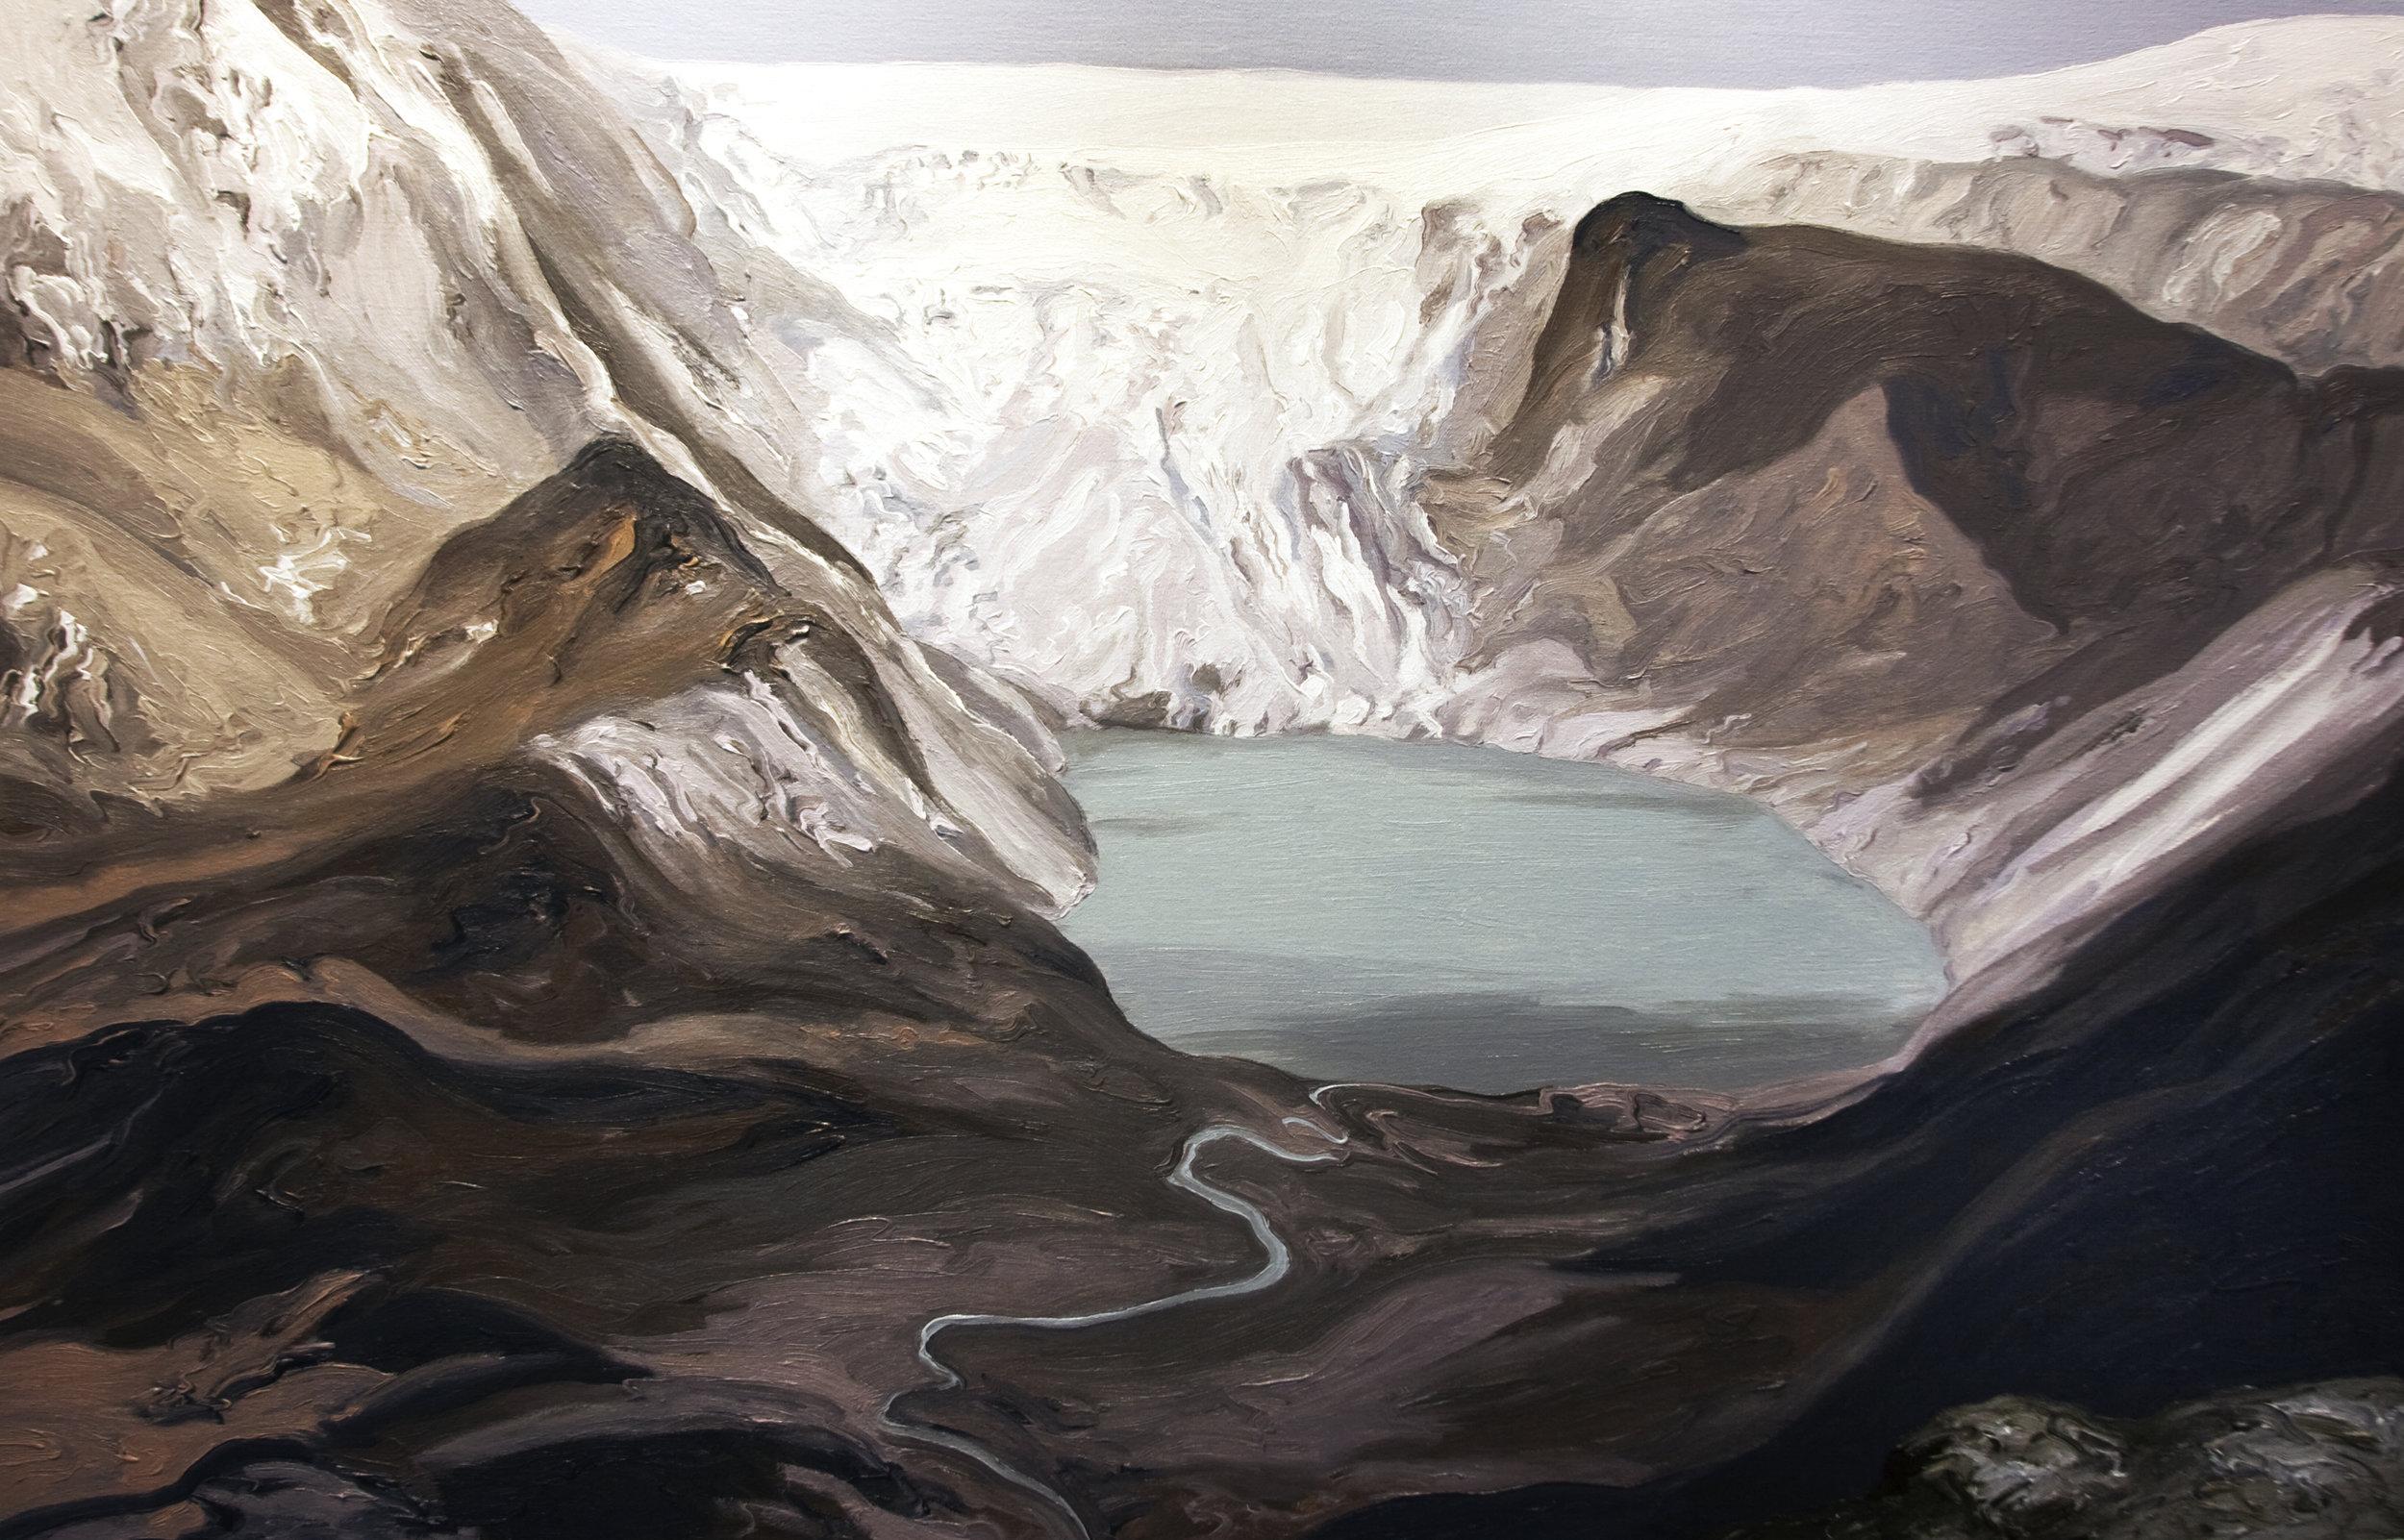 Qori Kalis Glacier #2, 2007, after Henry Brecher